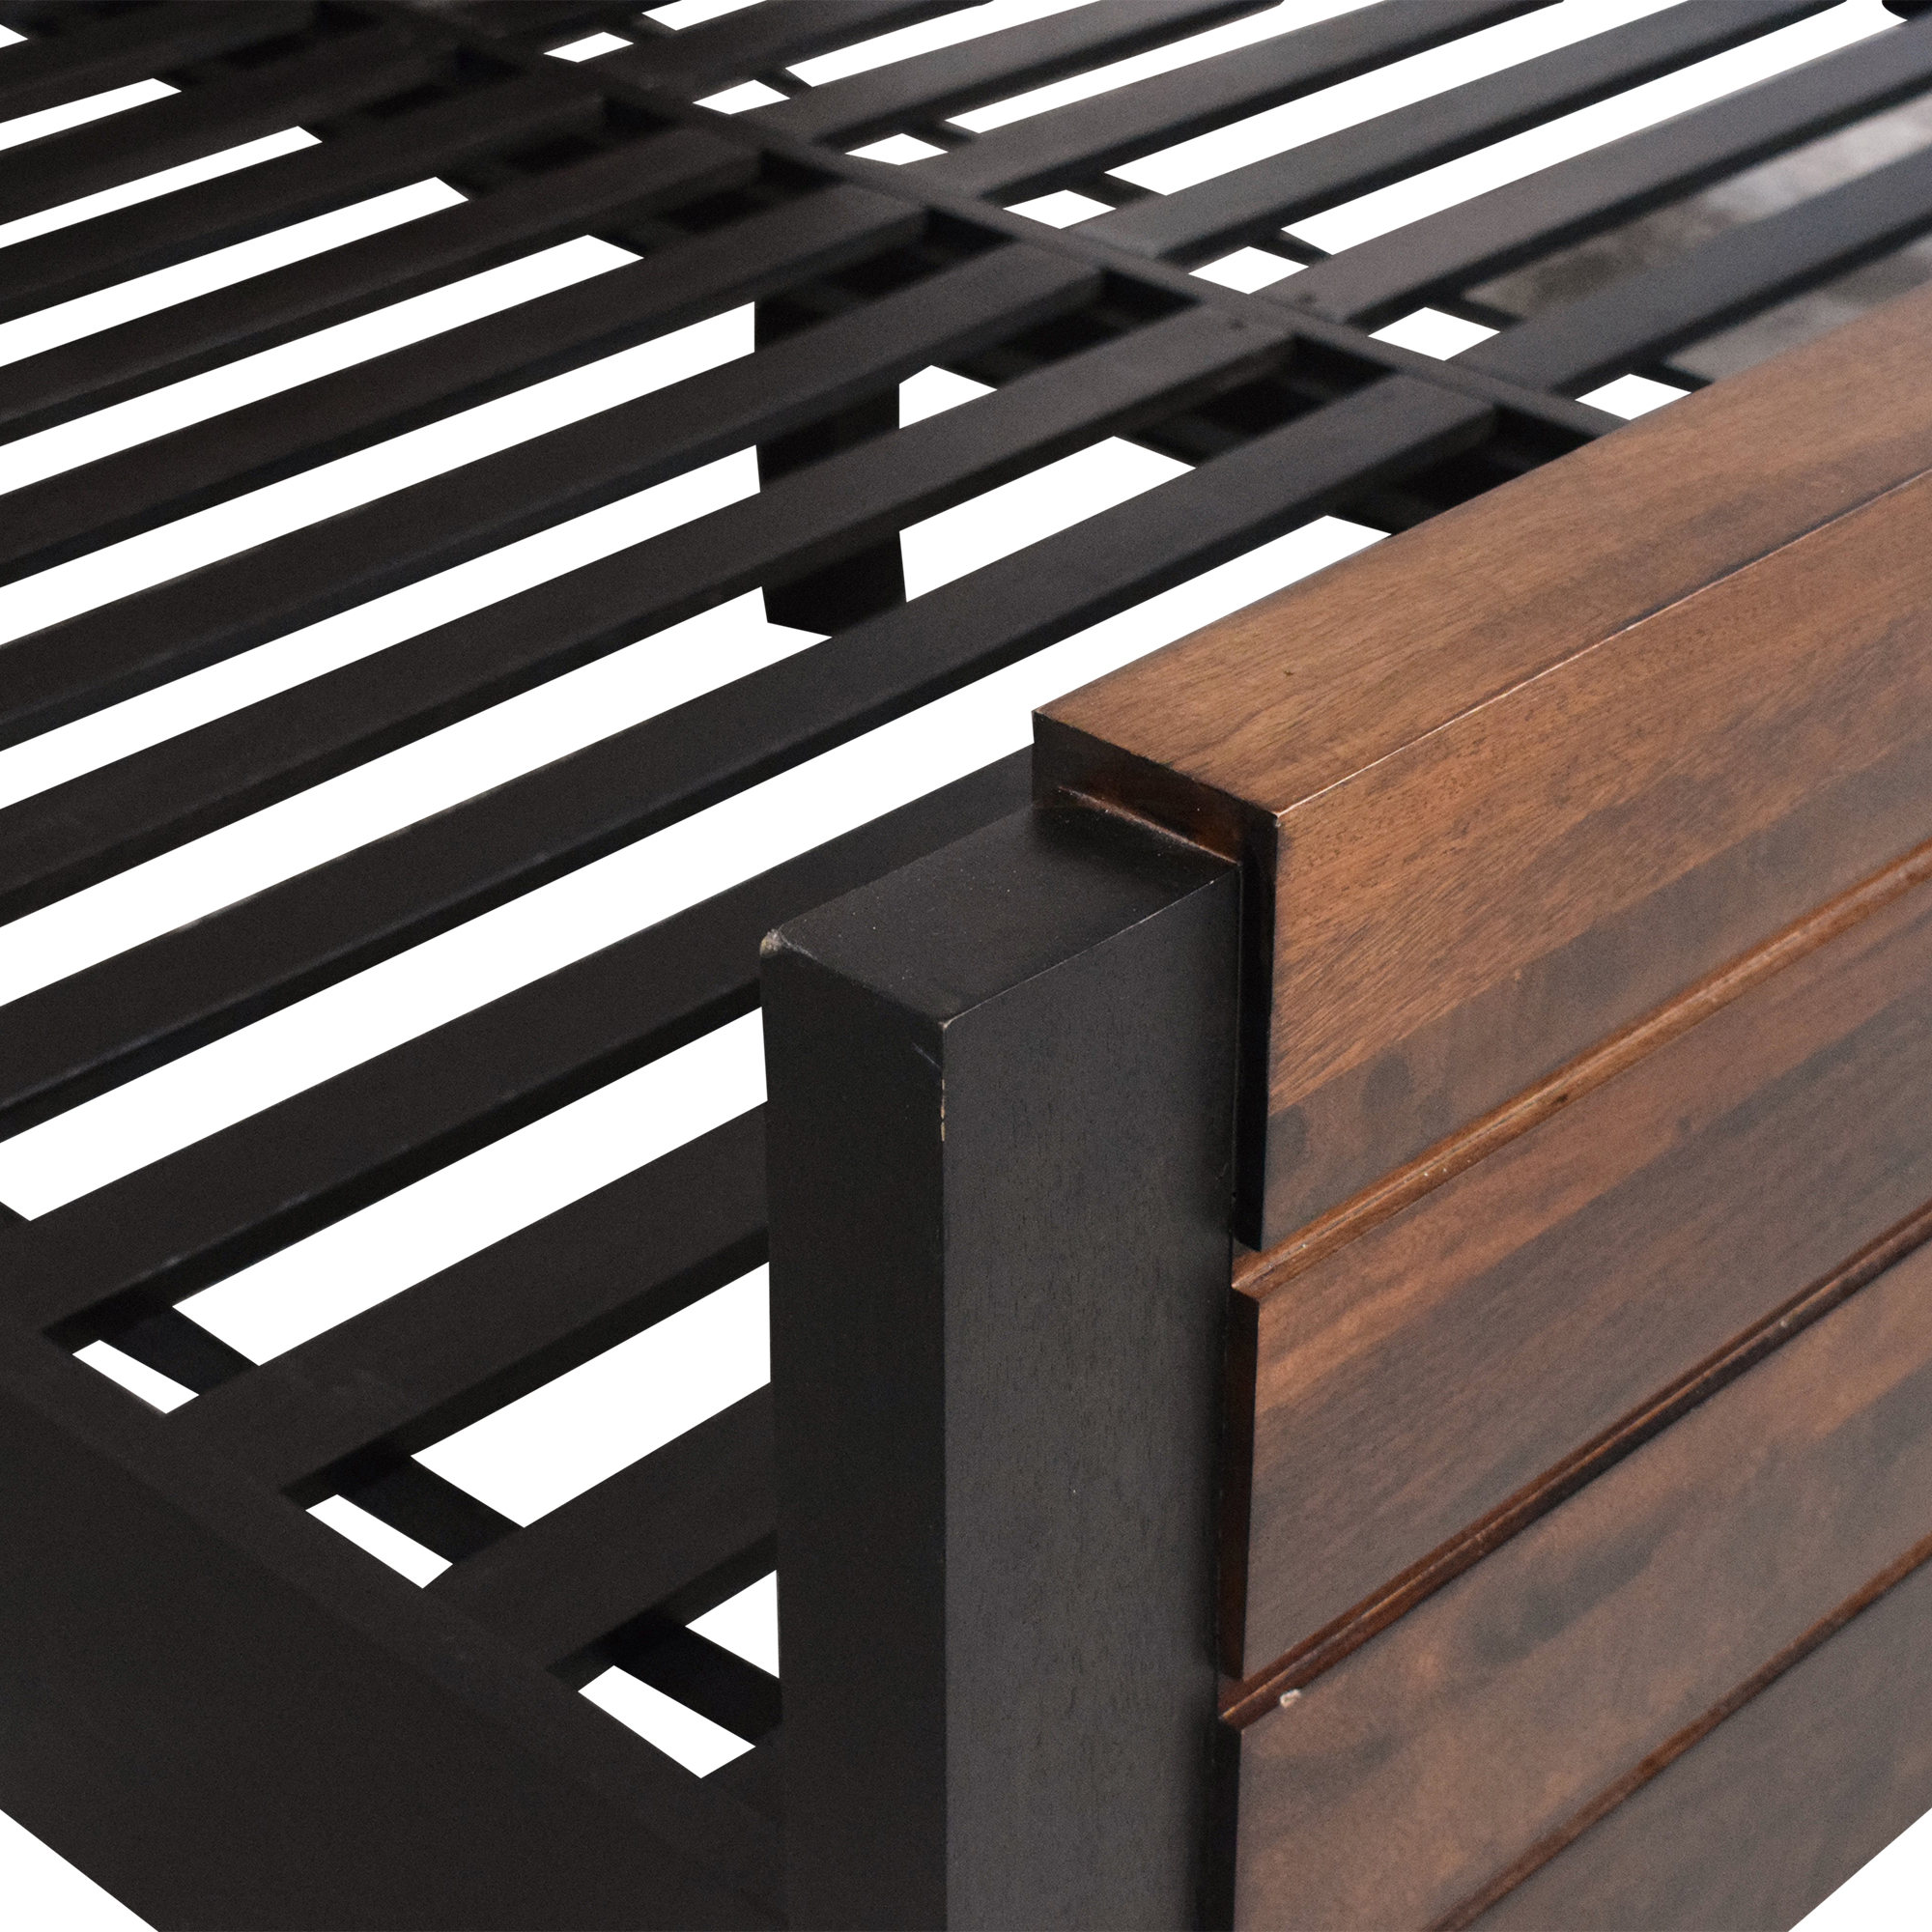 Crate & Barrel Crate & Barrel Forsyth King Bed second hand